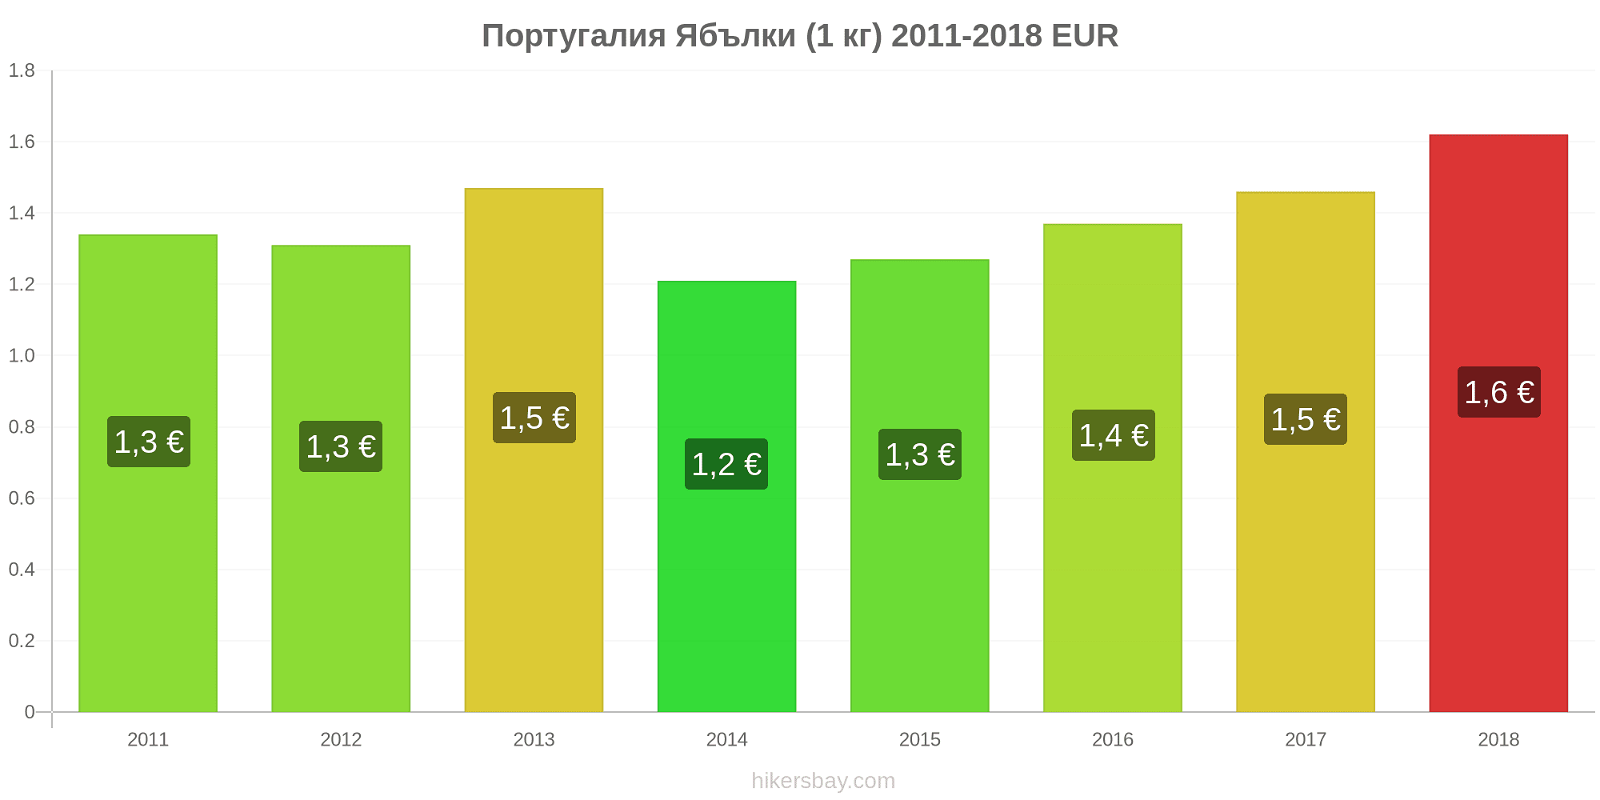 Португалия ценови промени Ябълки (1 кг) hikersbay.com